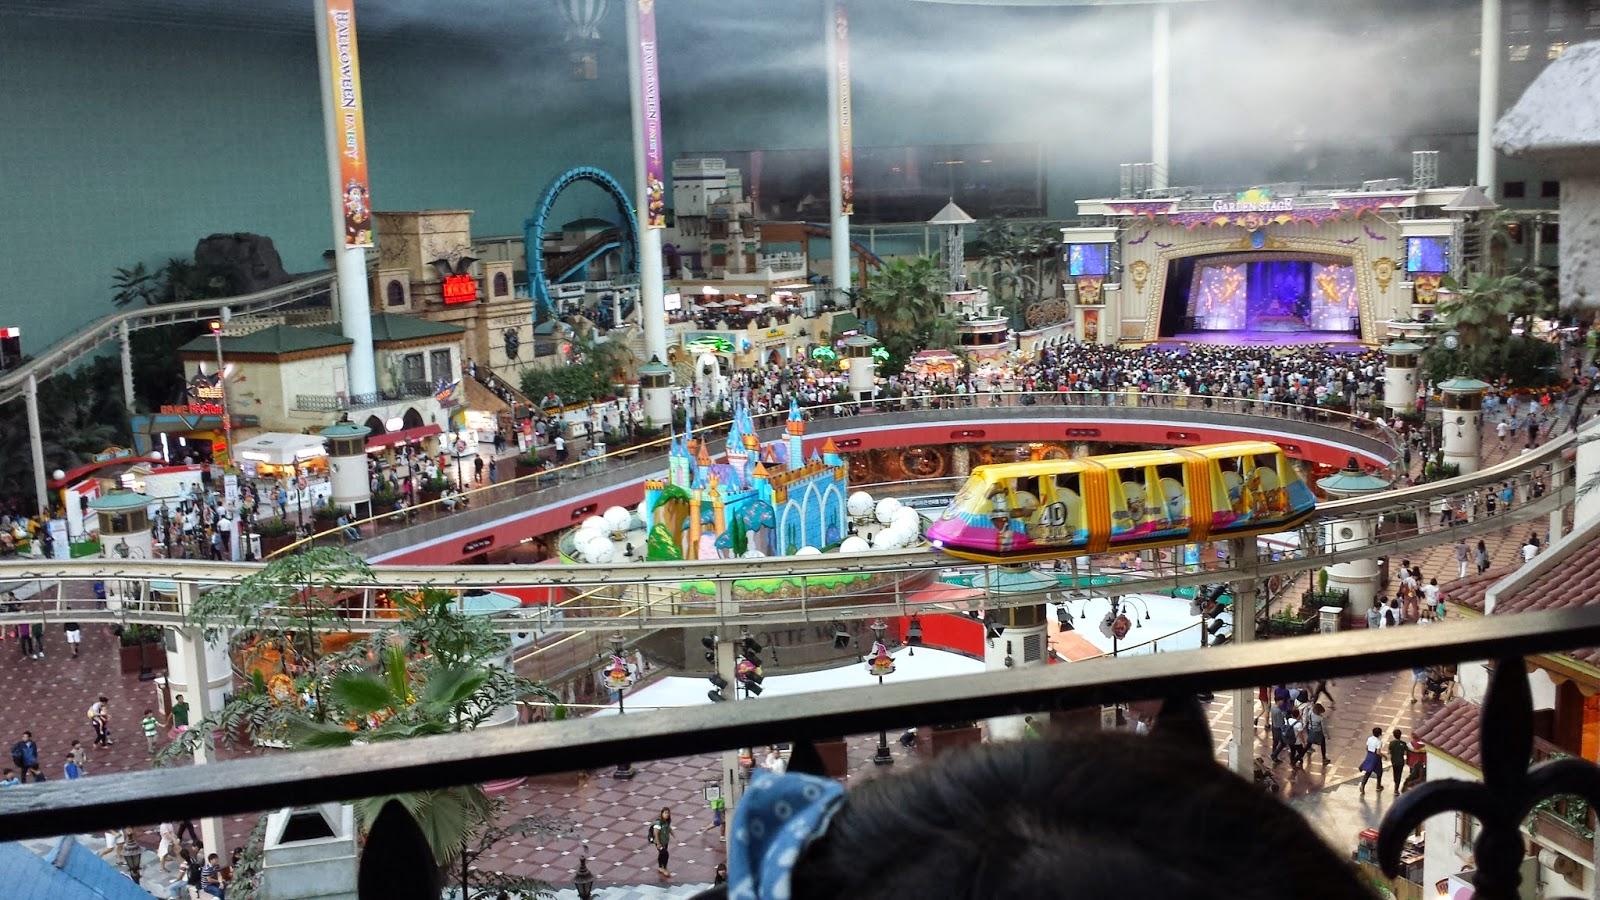 Lotte World Map Pdf. Lotte World And Everland 20140920 172811 3 Bestshot 5B1 5D Theme Park In Korea support specialist cover letter cash